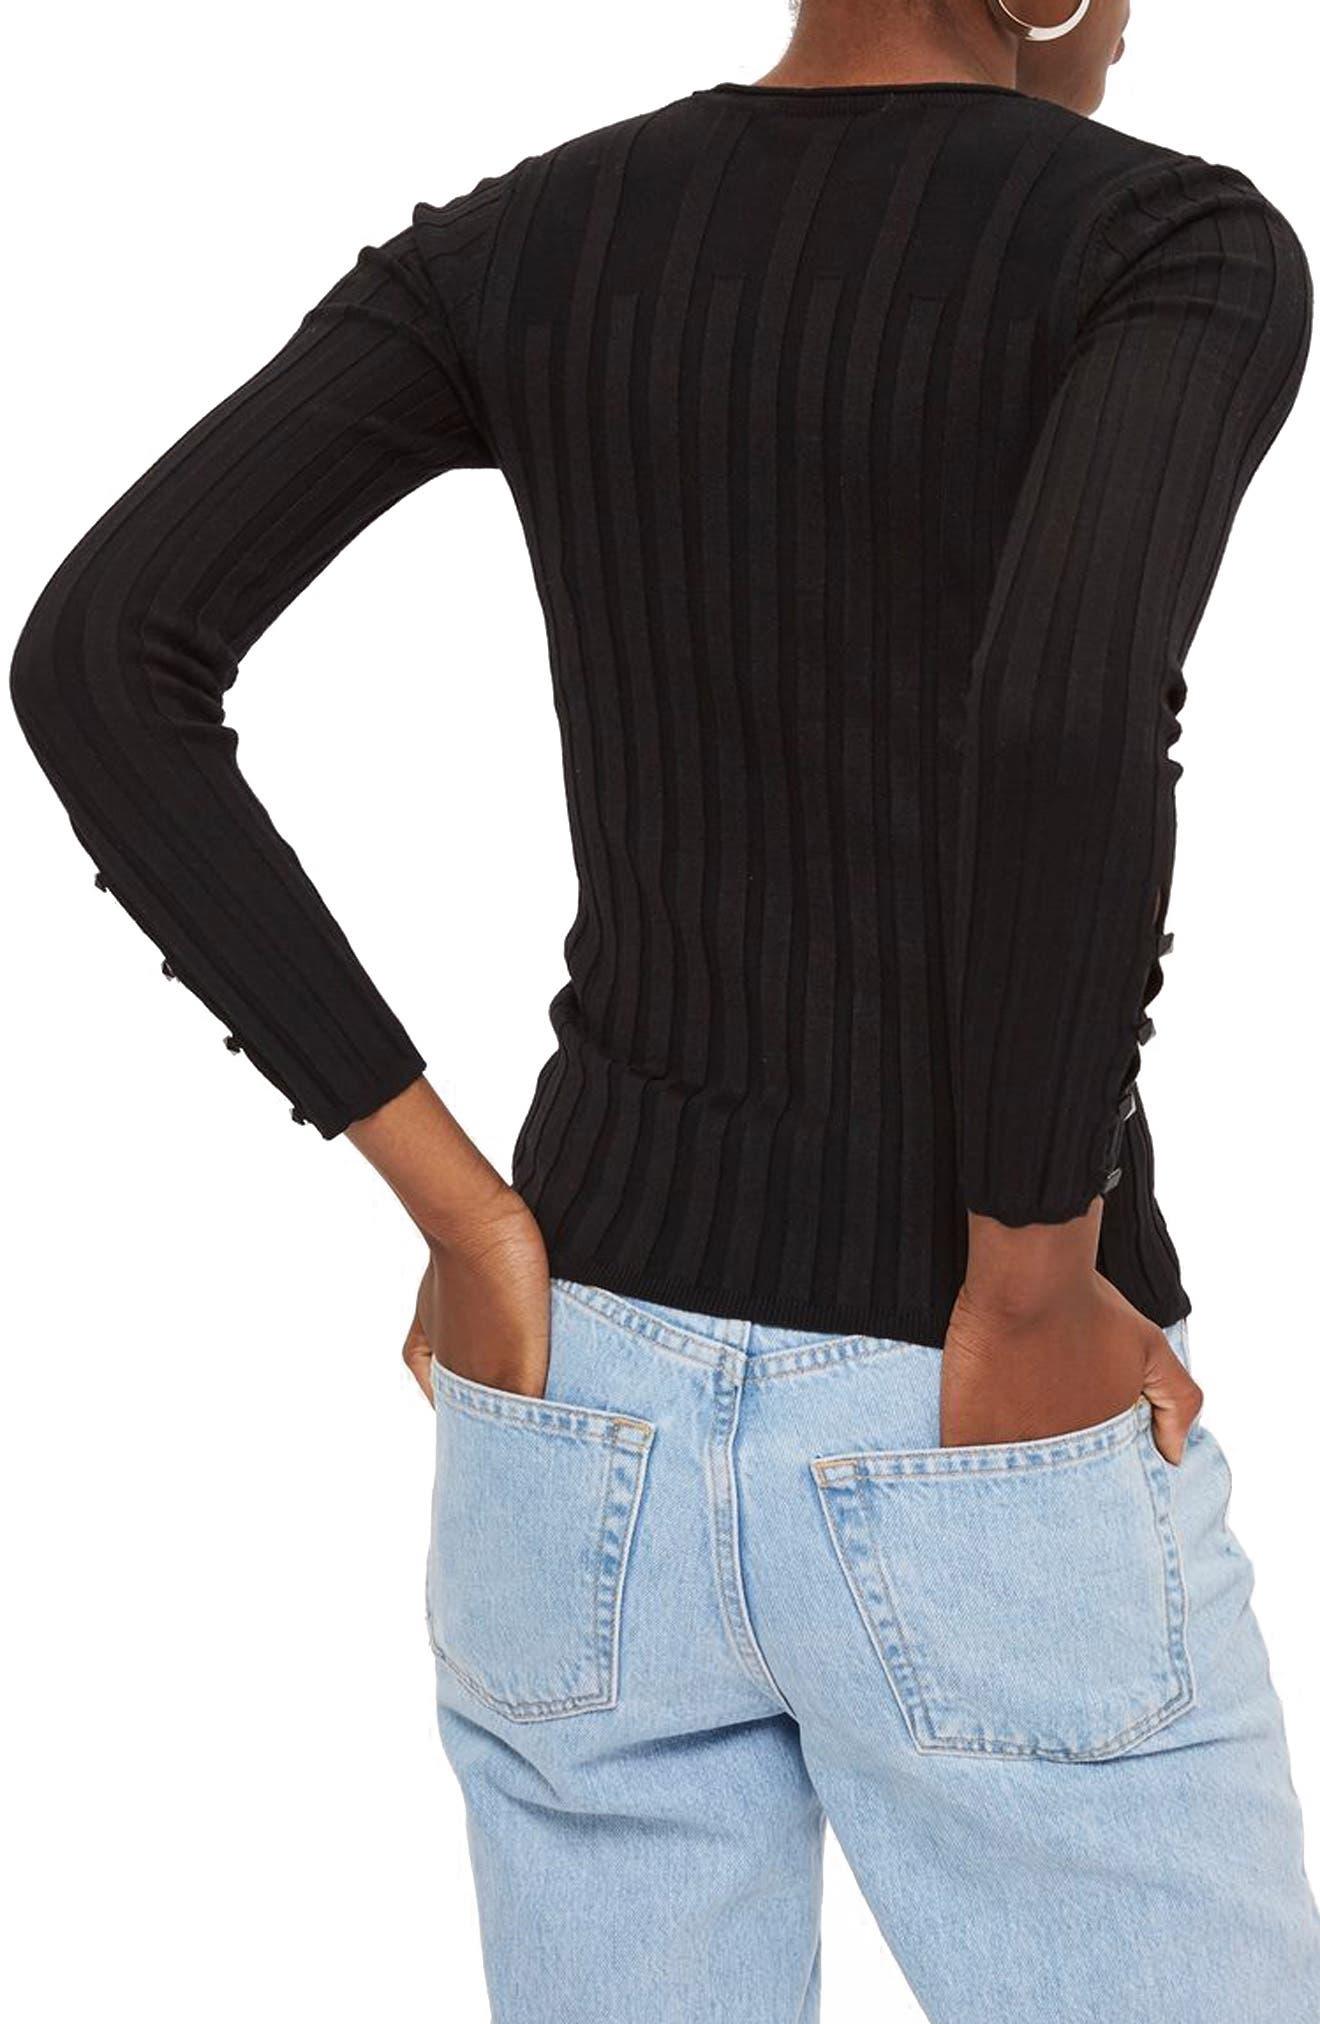 TOPSHOP,                             Ribbed Sweater,                             Alternate thumbnail 2, color,                             BLACK